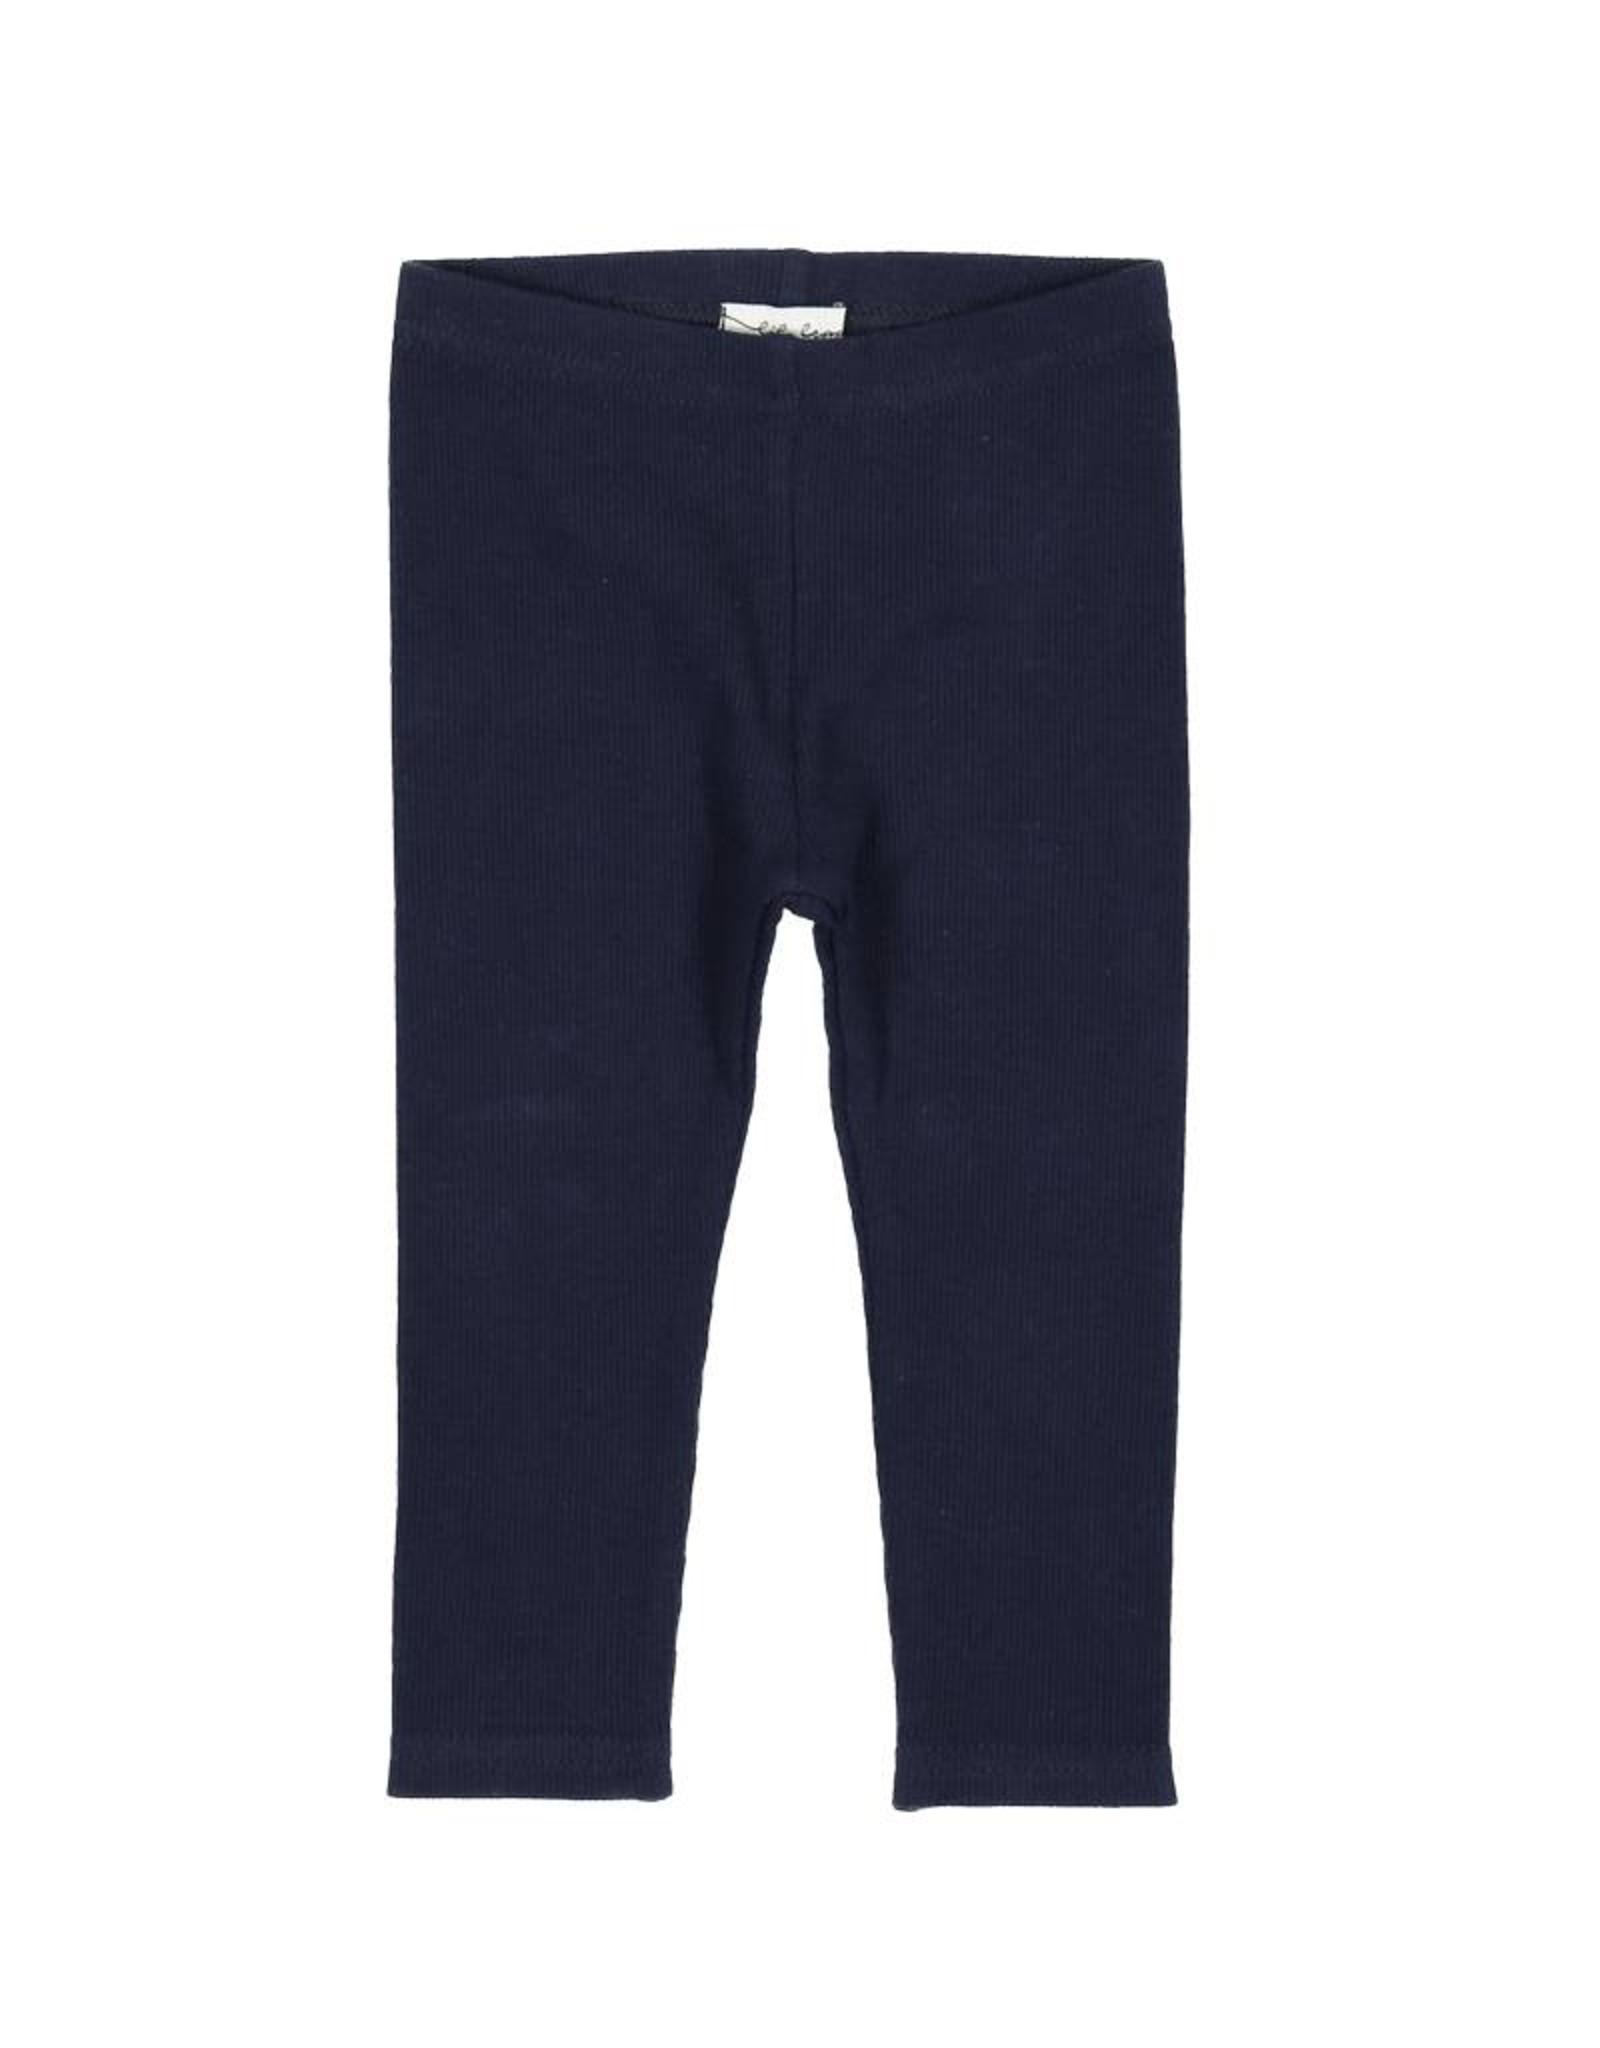 LIL LEGS Spring/Summer Ribbed Leggings Basic Colors